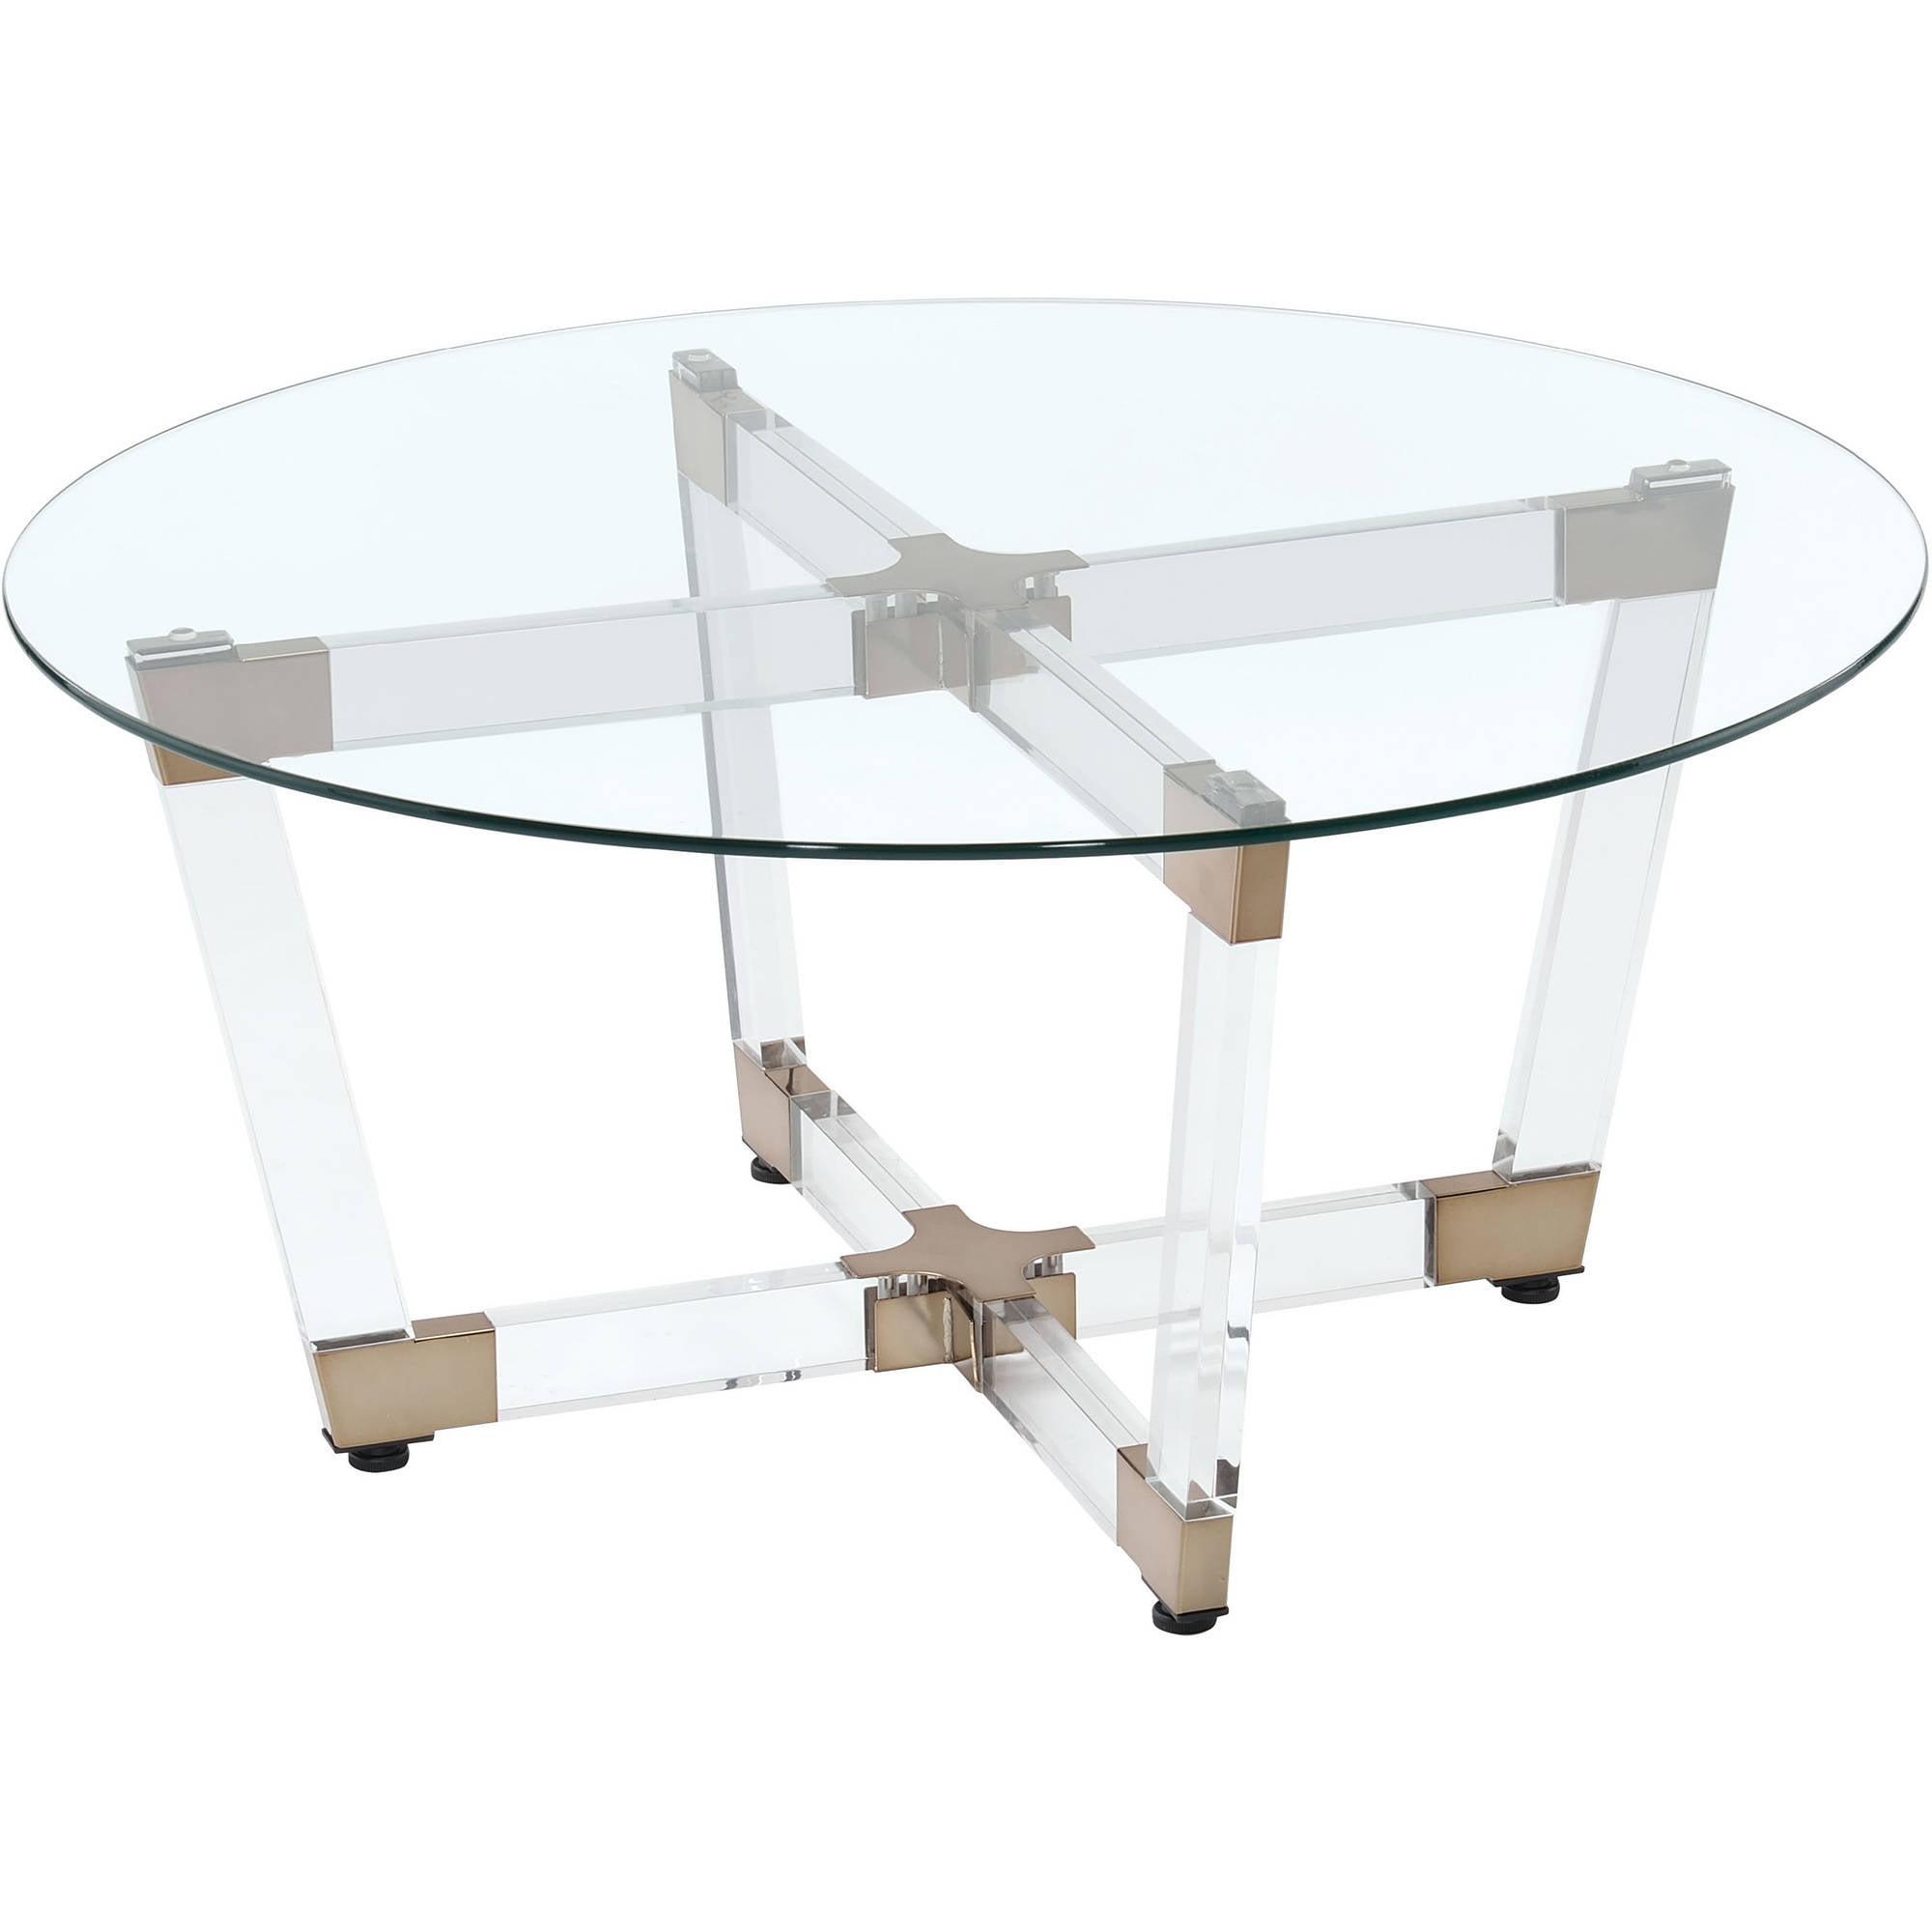 Coaster Company Coffee Table, Chocolate and Chocolate and Chrome Clear Acrylic